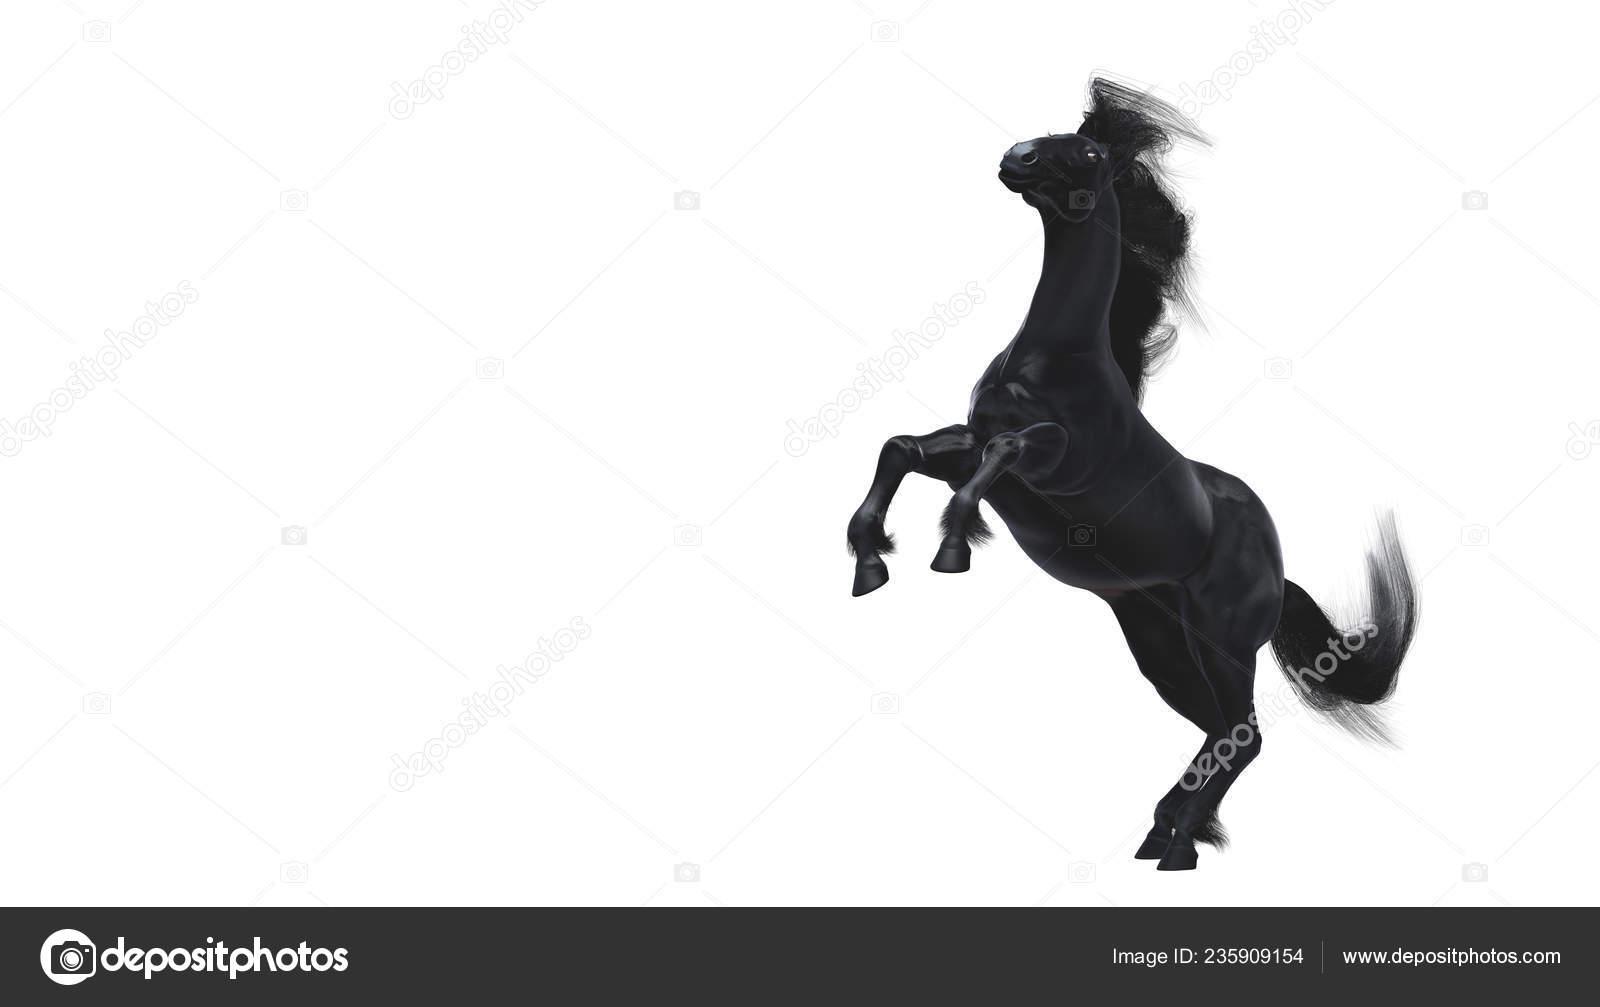 Black Running Horse White Background Stock Photo C Vitaliy Sokol 235909154